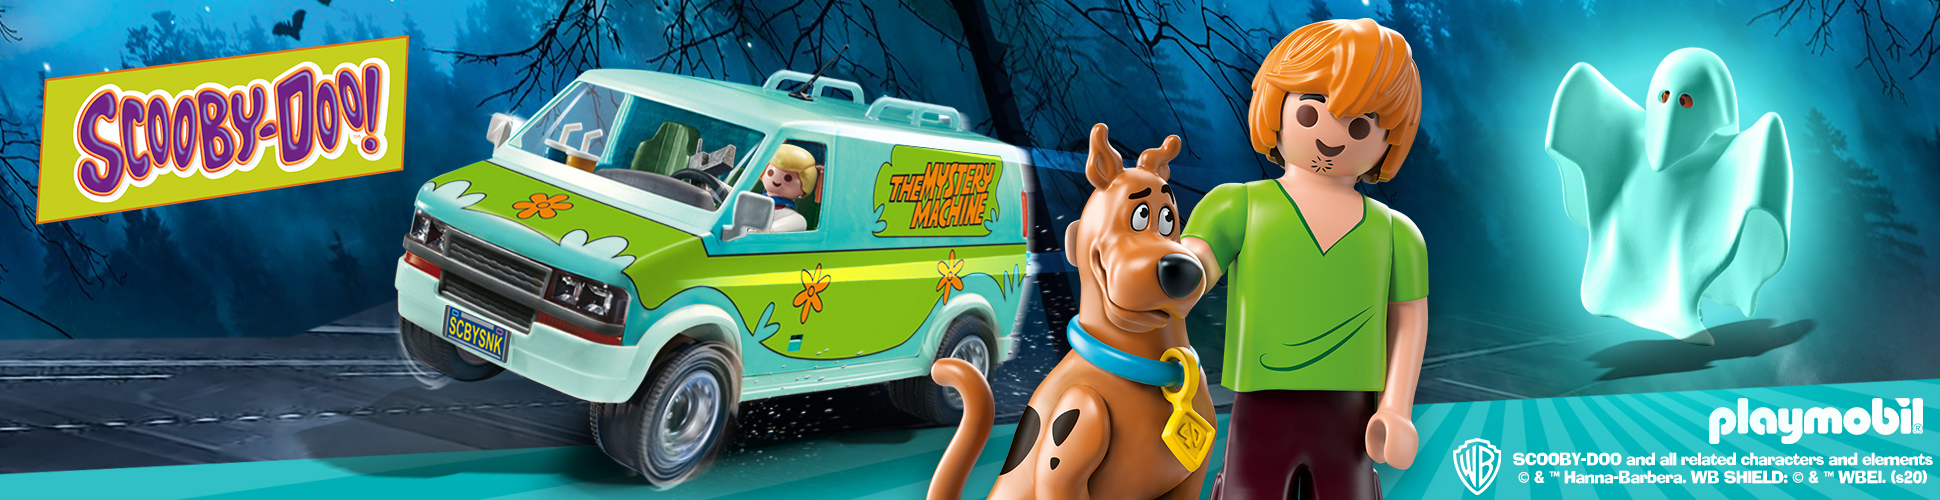 1940x500_ScoobyDoo